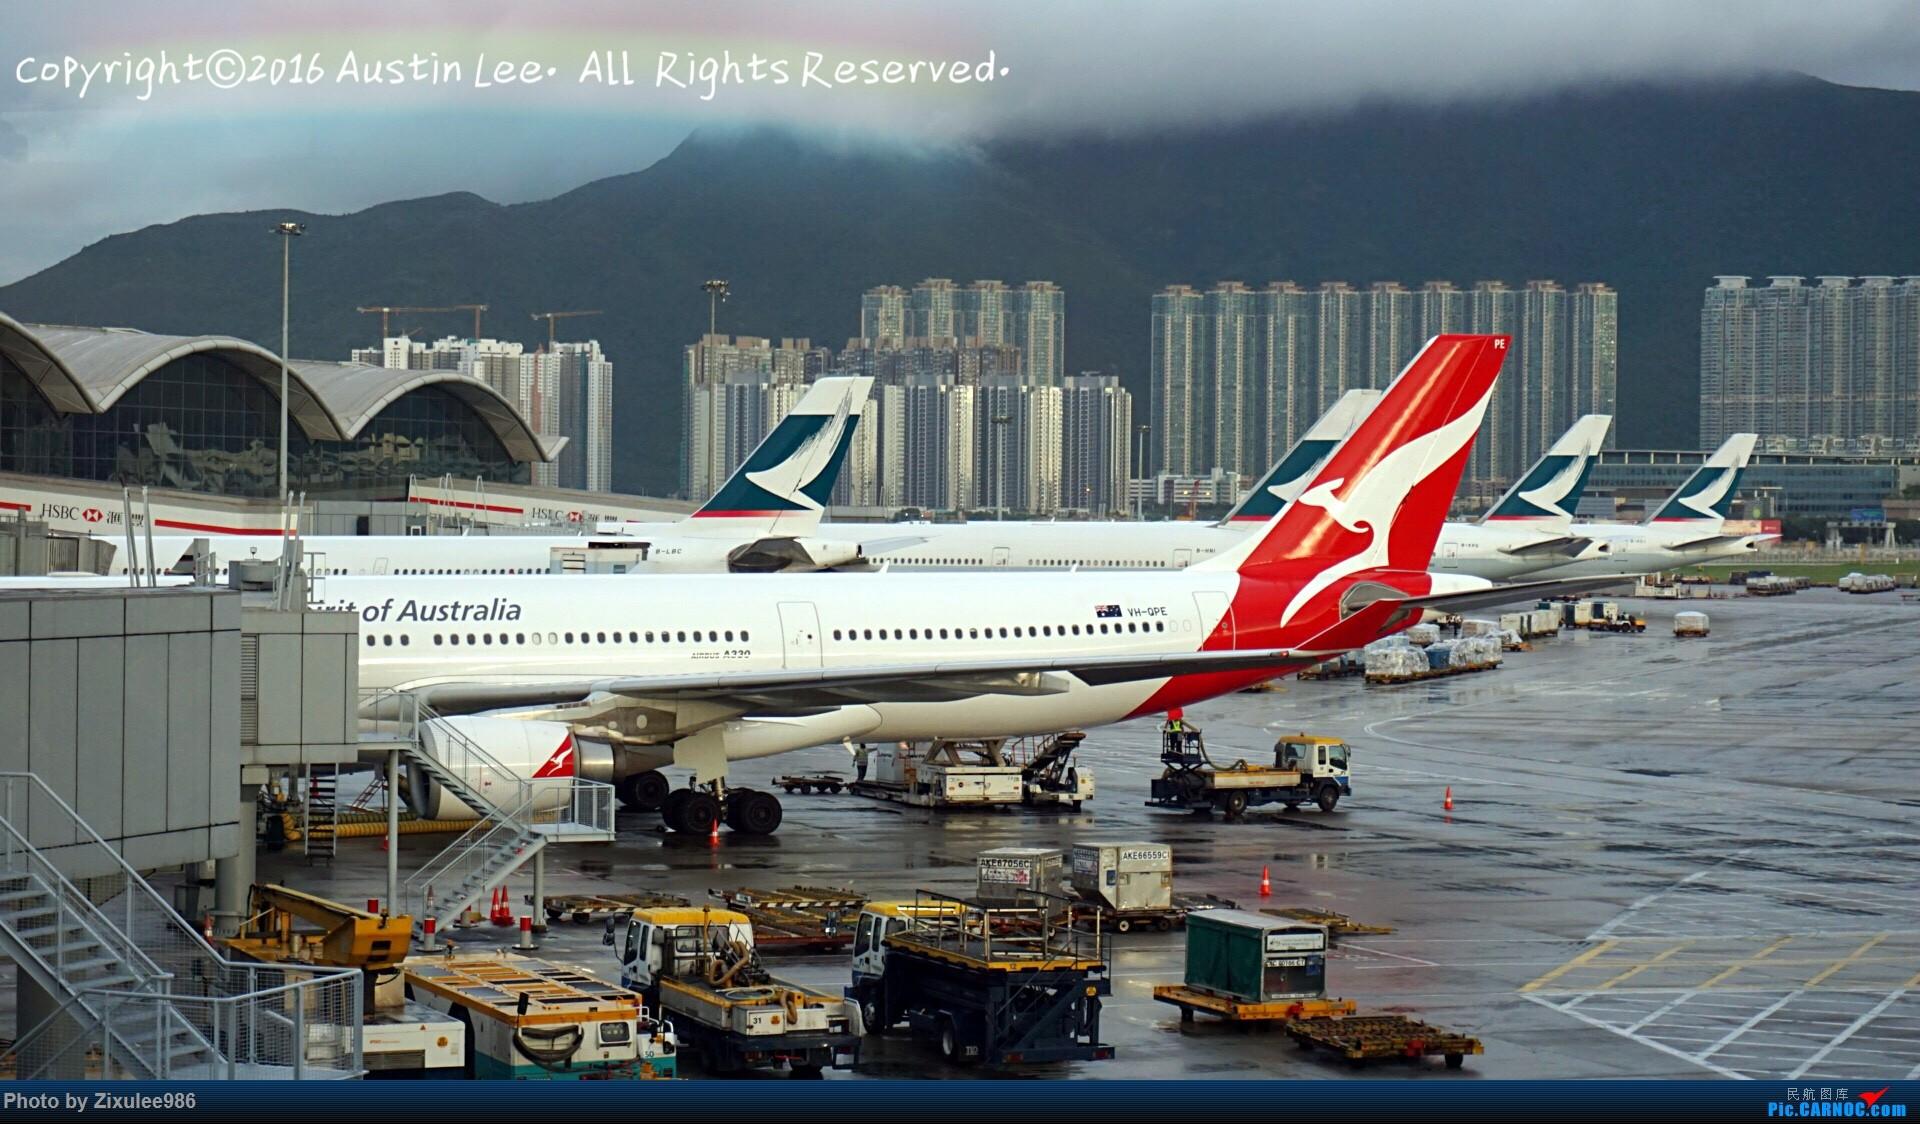 Re:[原创]论坛修复后第一波~三年来旅游途中的拍机精选~ AIRBUS A330-303 VH-QPE 中国香港国际机场